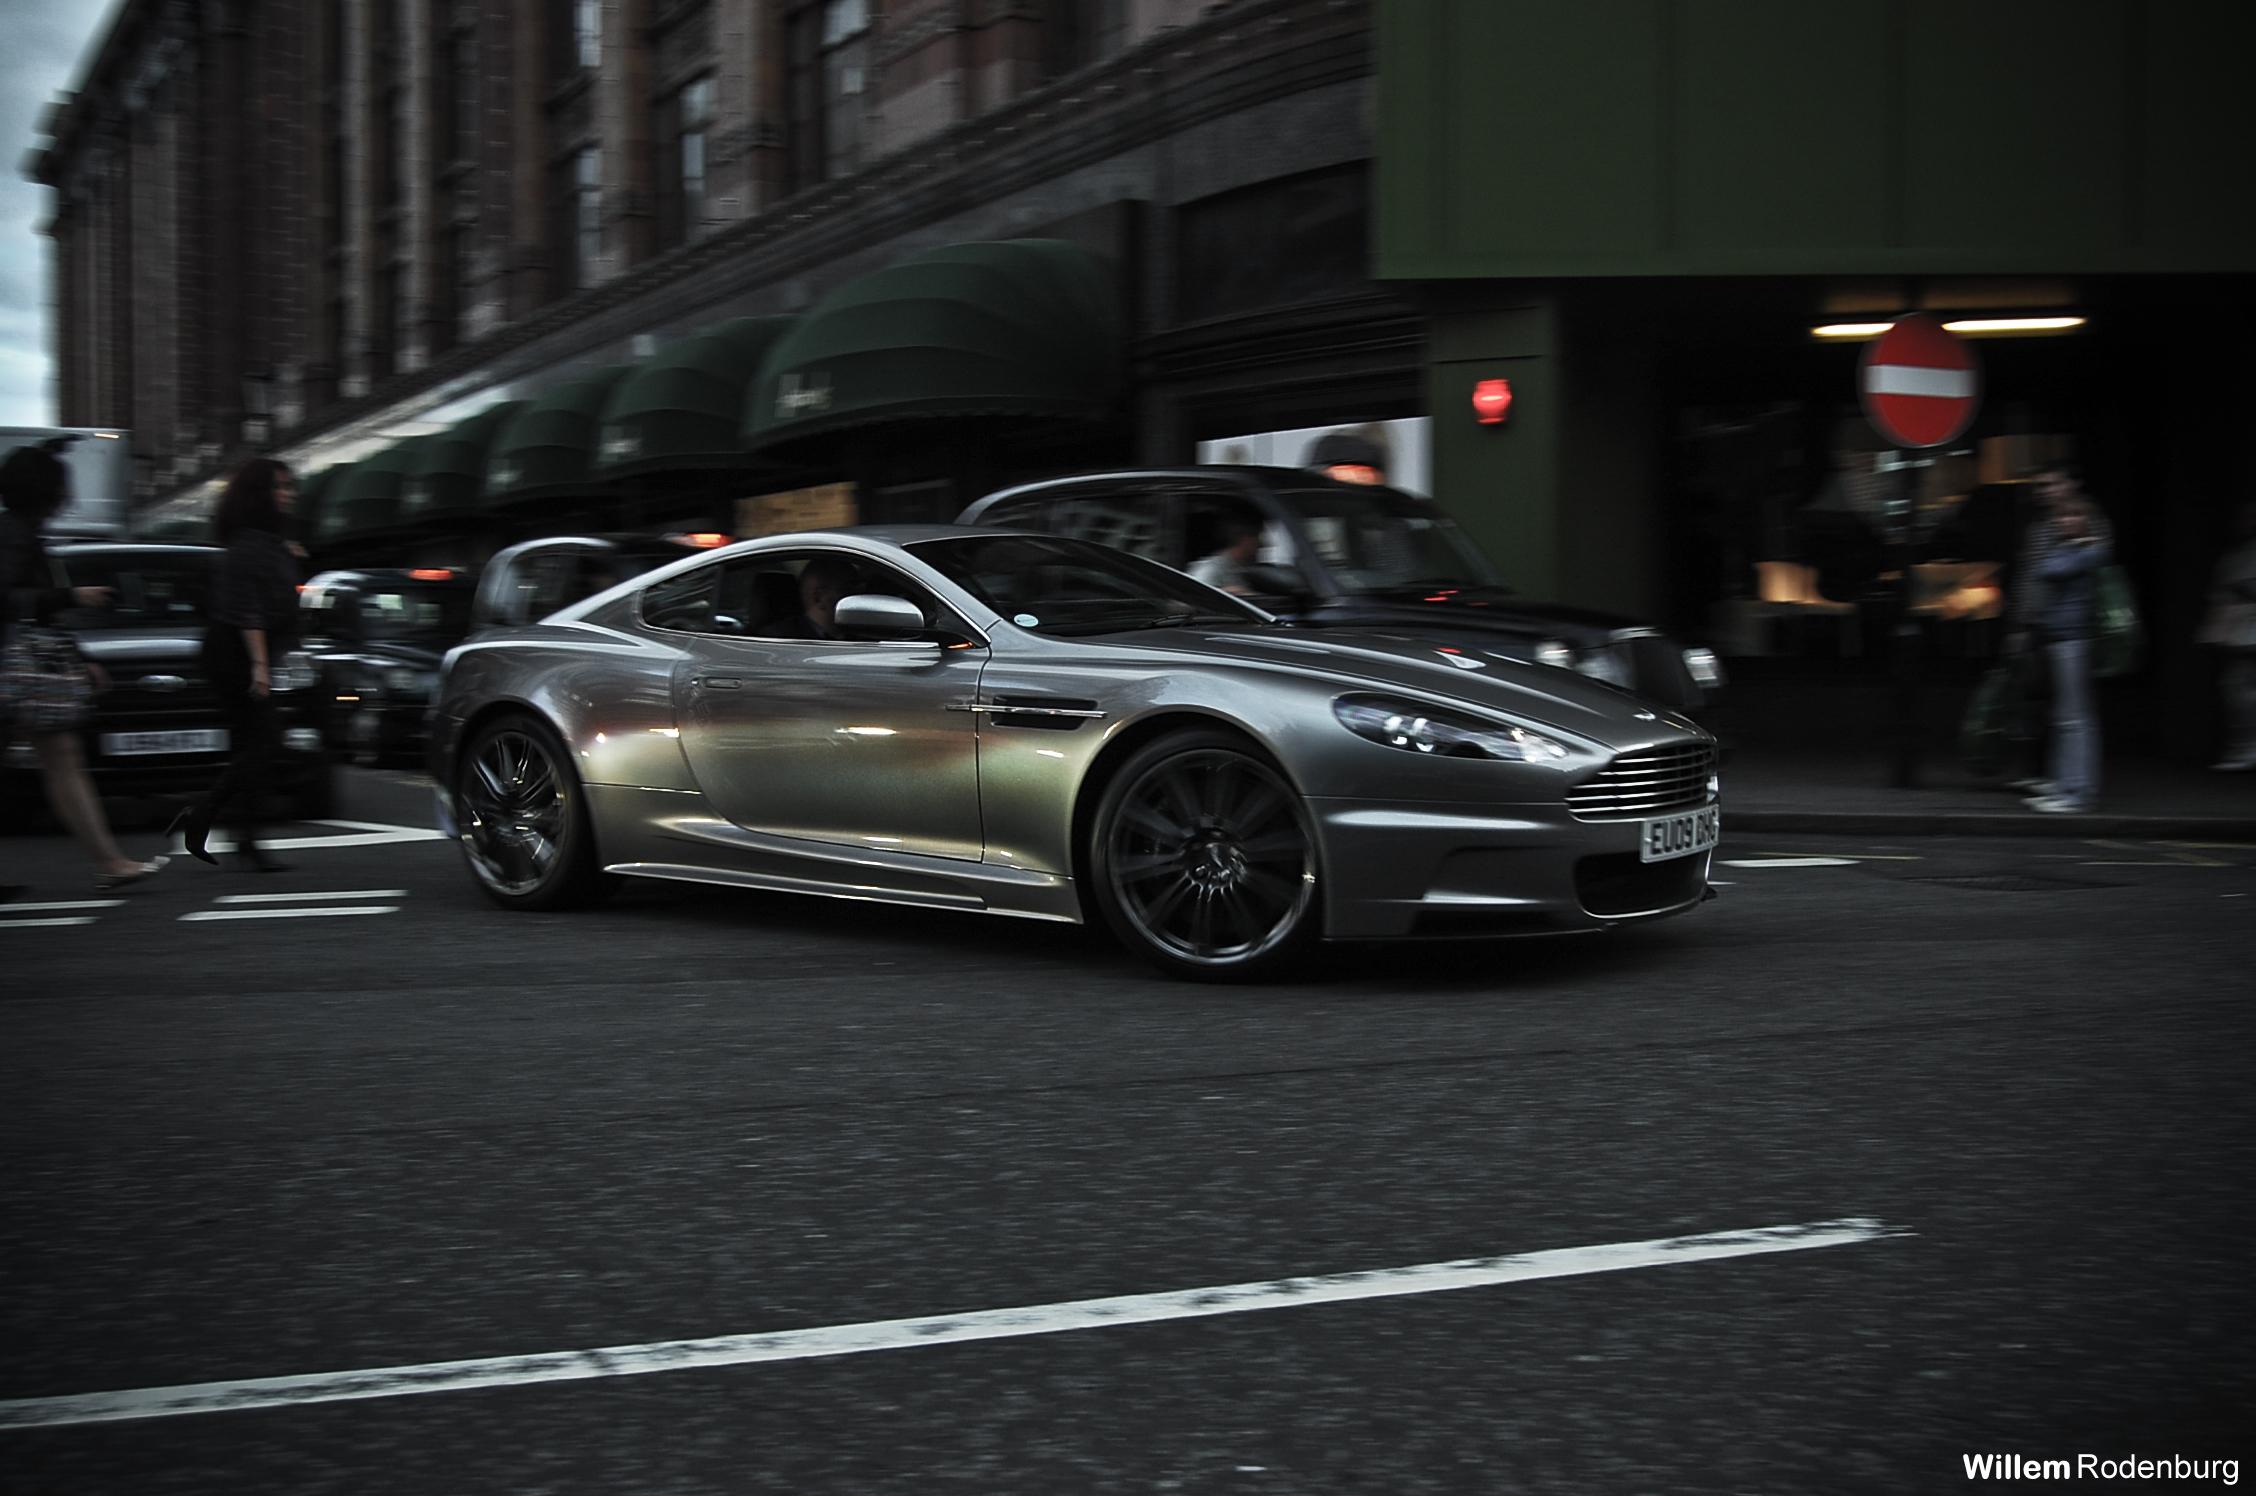 Wallpaper London Photoshop Street Road Photography Gentleman Mercedes Benz Grey Nikon Kingdom Sports Car Money Aston Martin DBS Silver